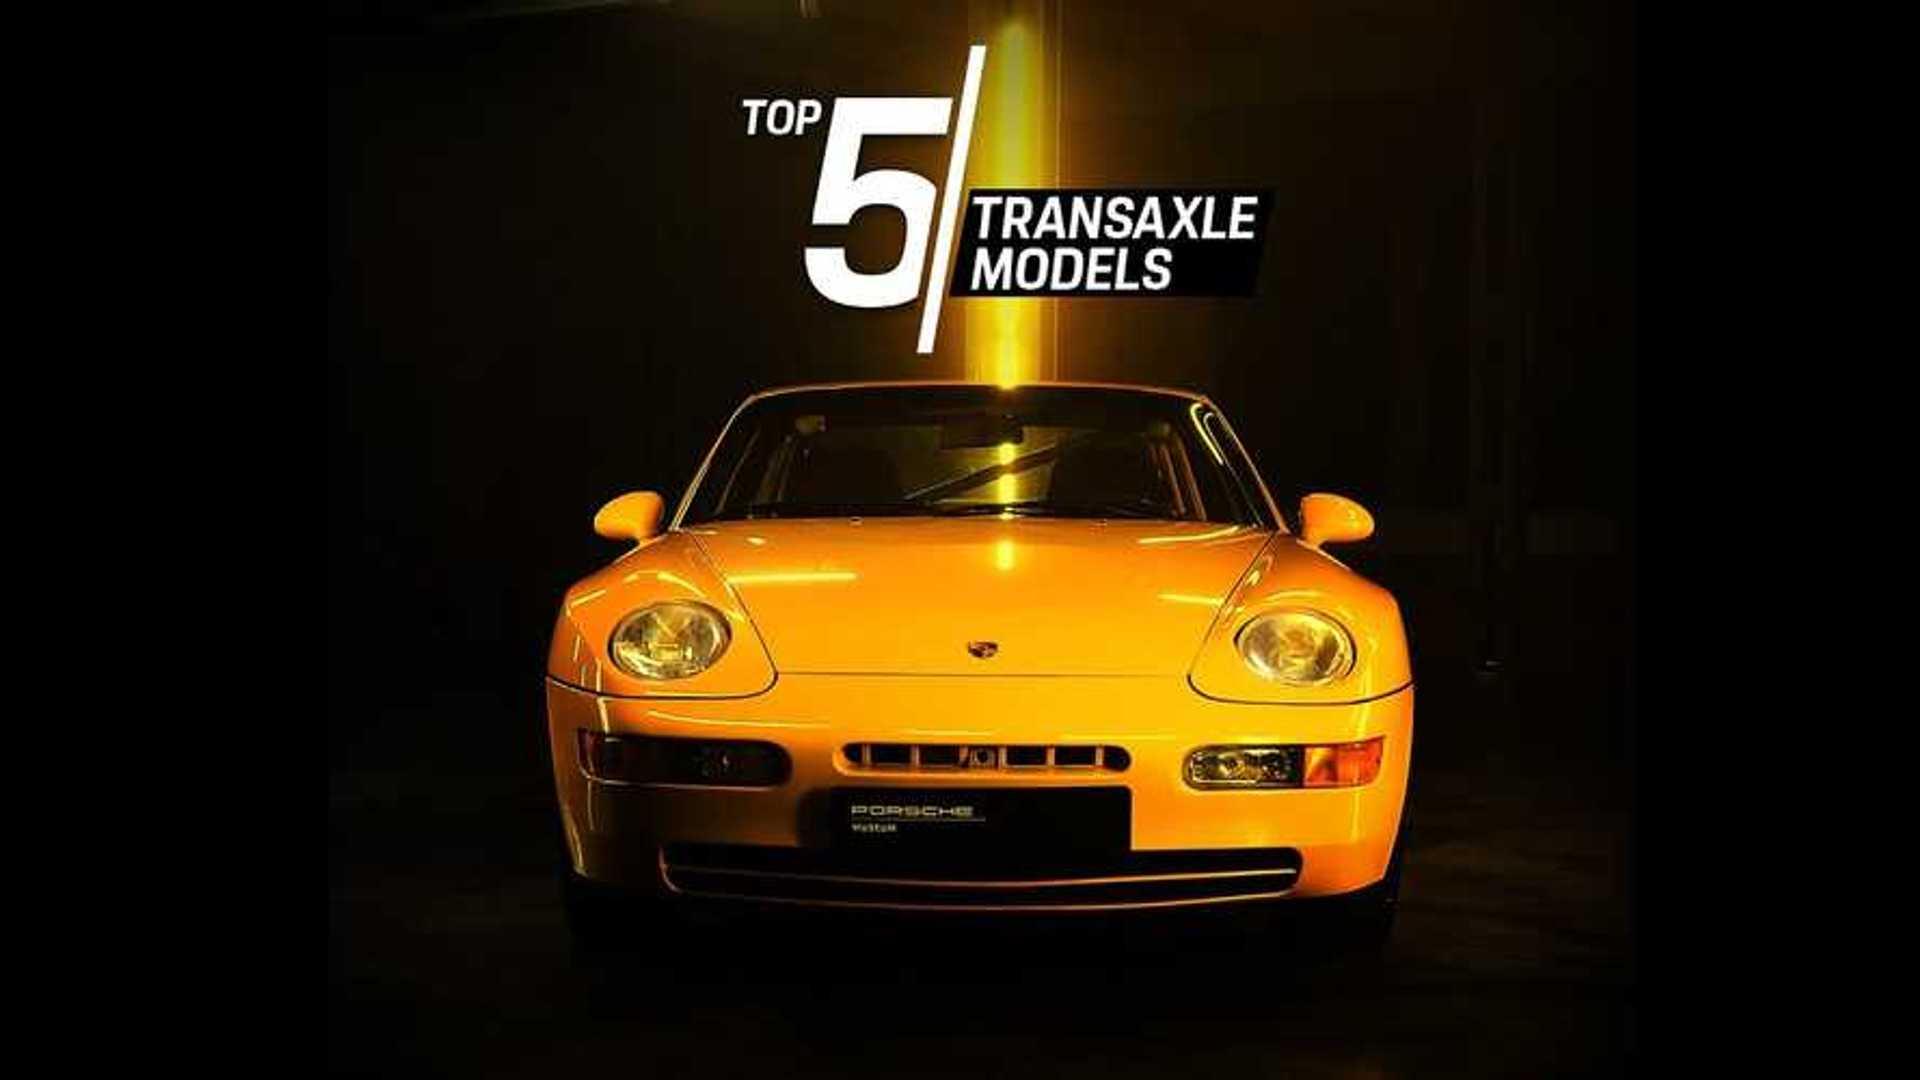 Porsche Creates Top 5 Of Its Best Transaxle Models